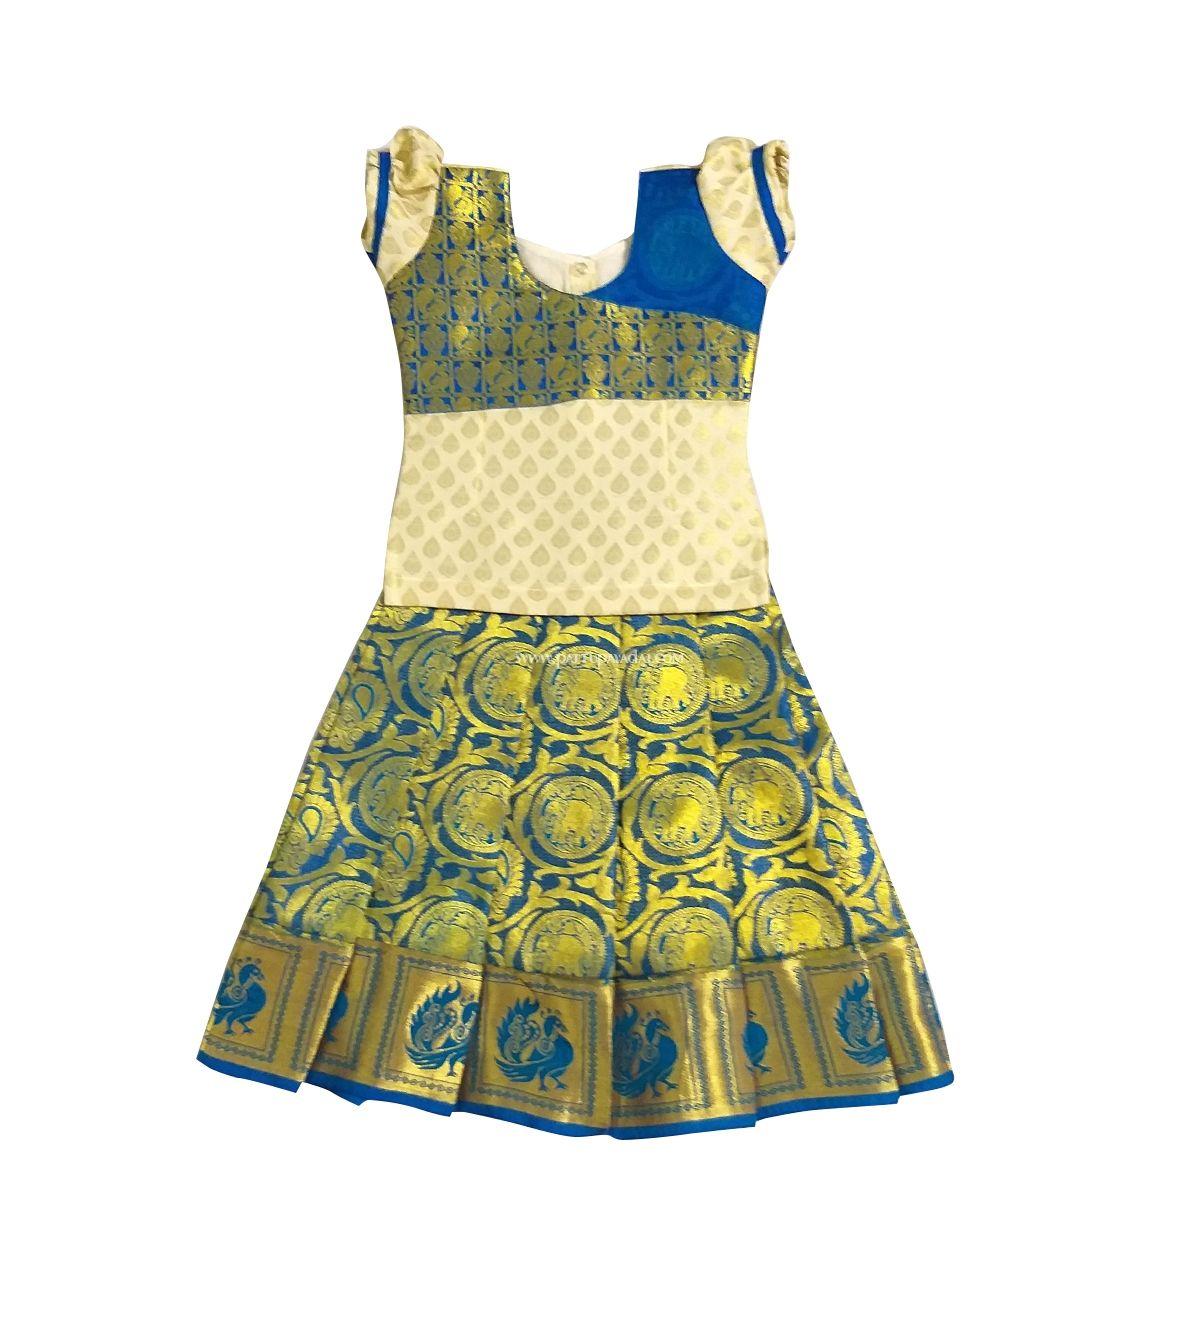 7d9cdeb6cb Traditional zari work pure silk pattu pavadai. Available for newborn kids  to 14 years girls. #Traditionalpattupavadai #girlsfashion #kidsethnicwear  ...